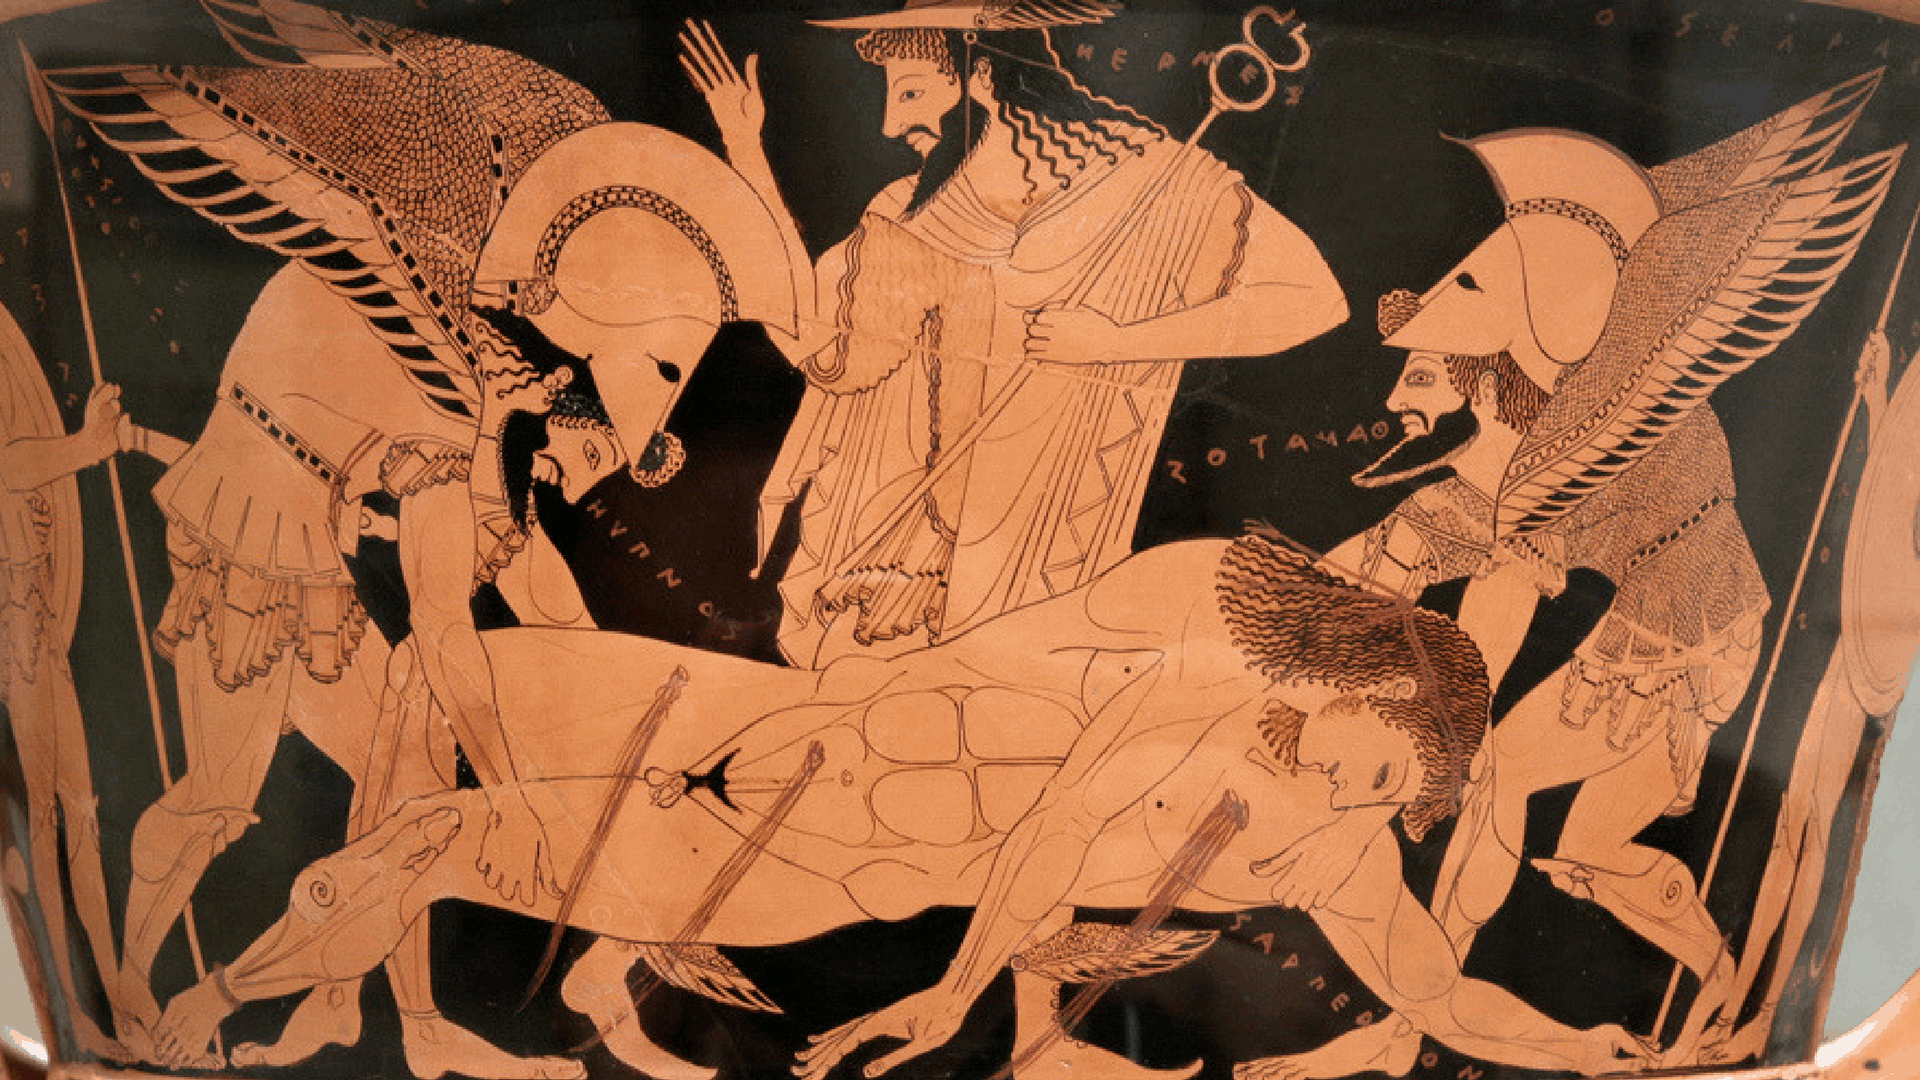 grecka mitologia